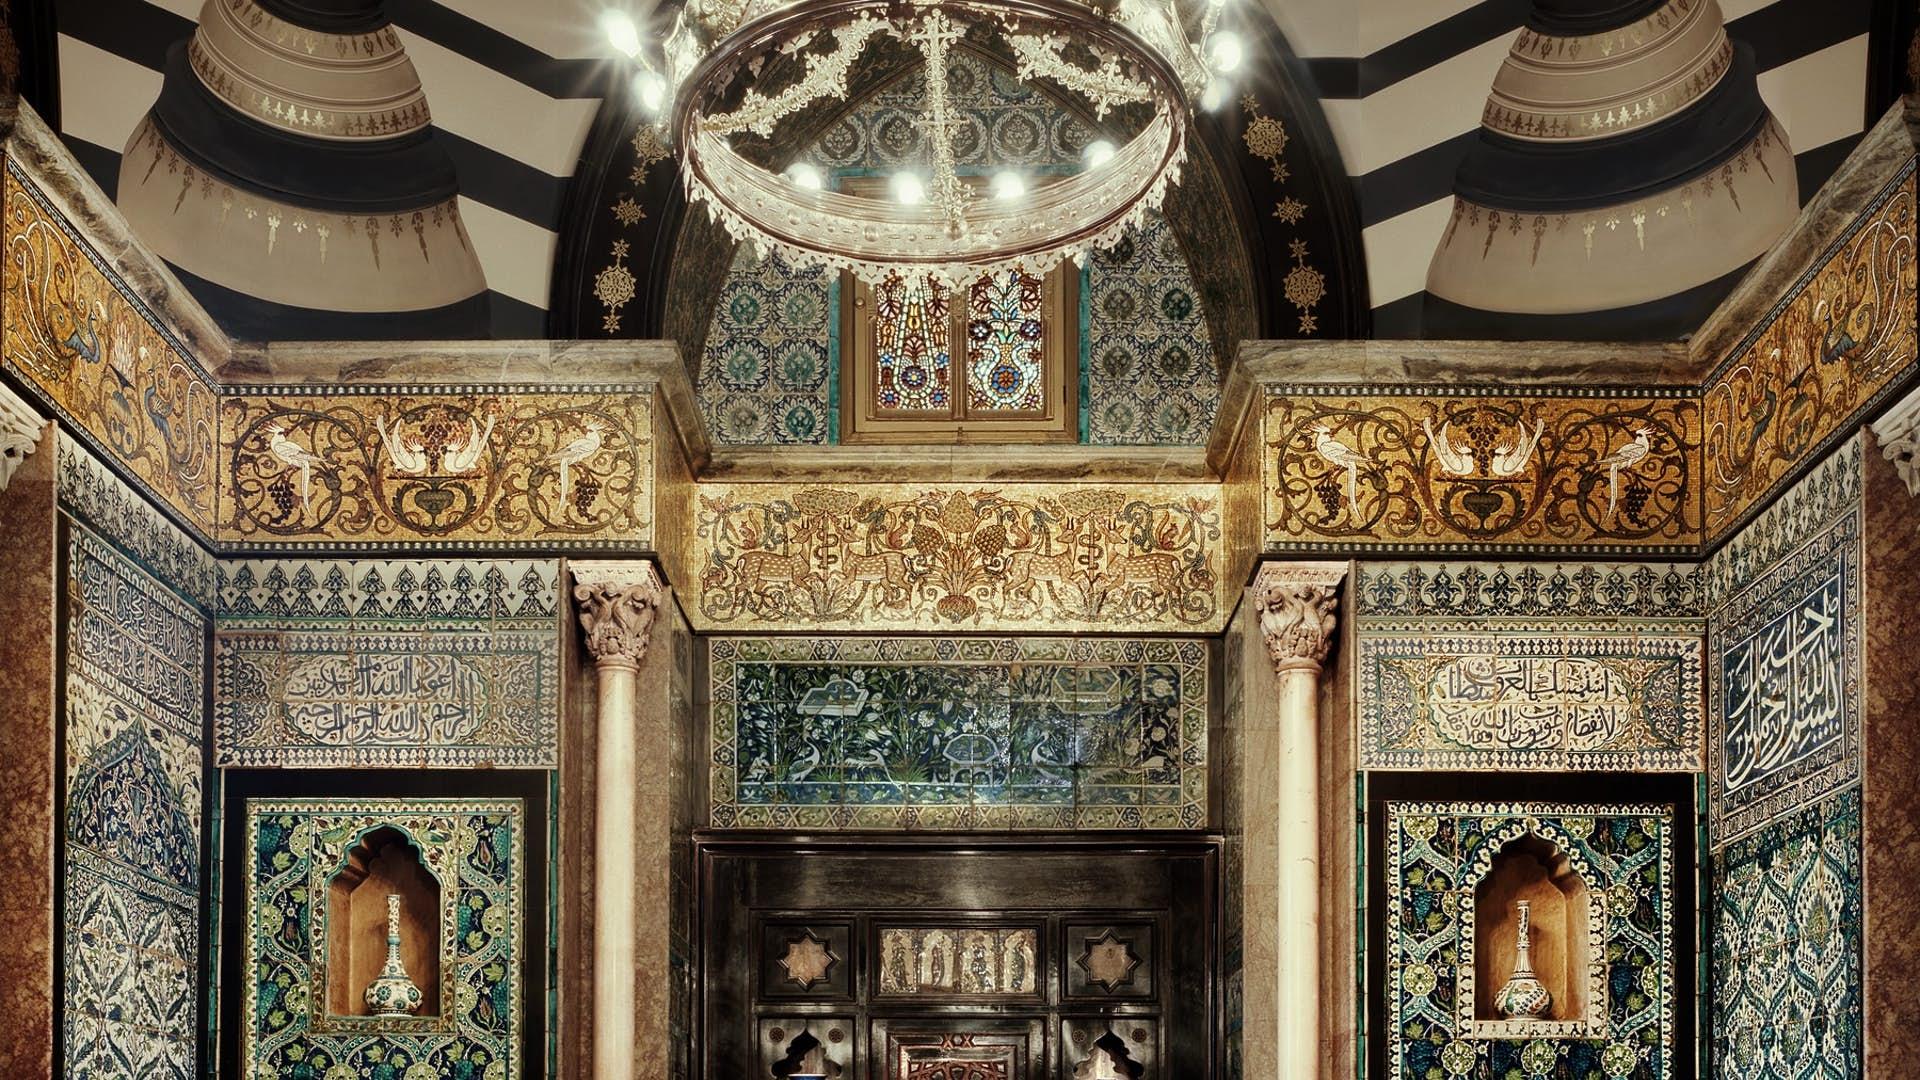 Arab Hall - Leighton House Museum